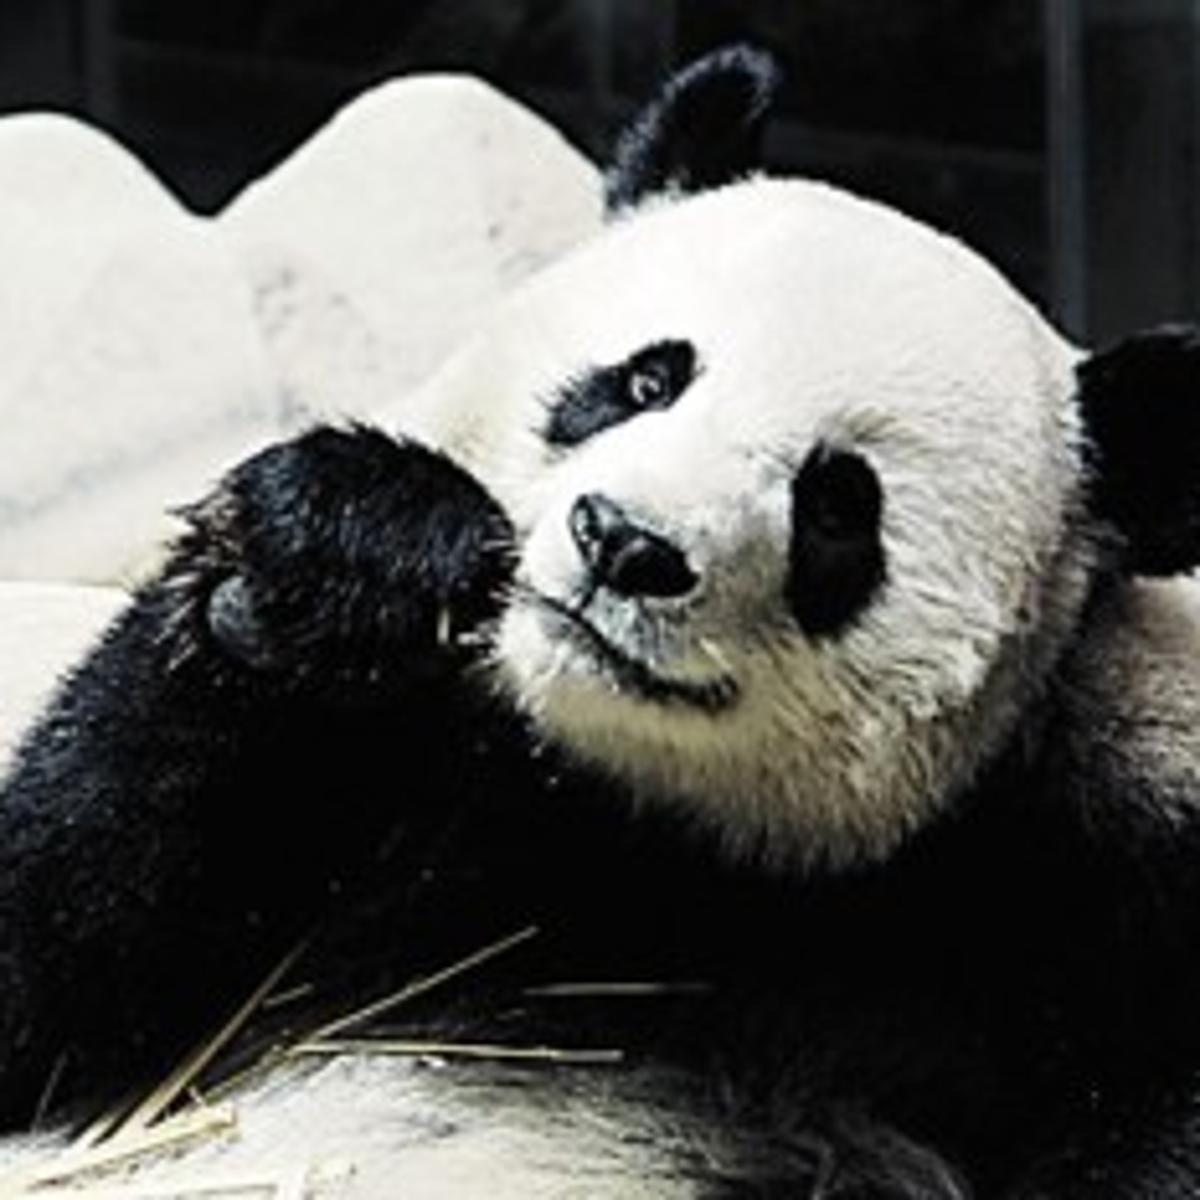 Animal Insemination Porn panda 'porn' part of bear baby boom | science | tucson